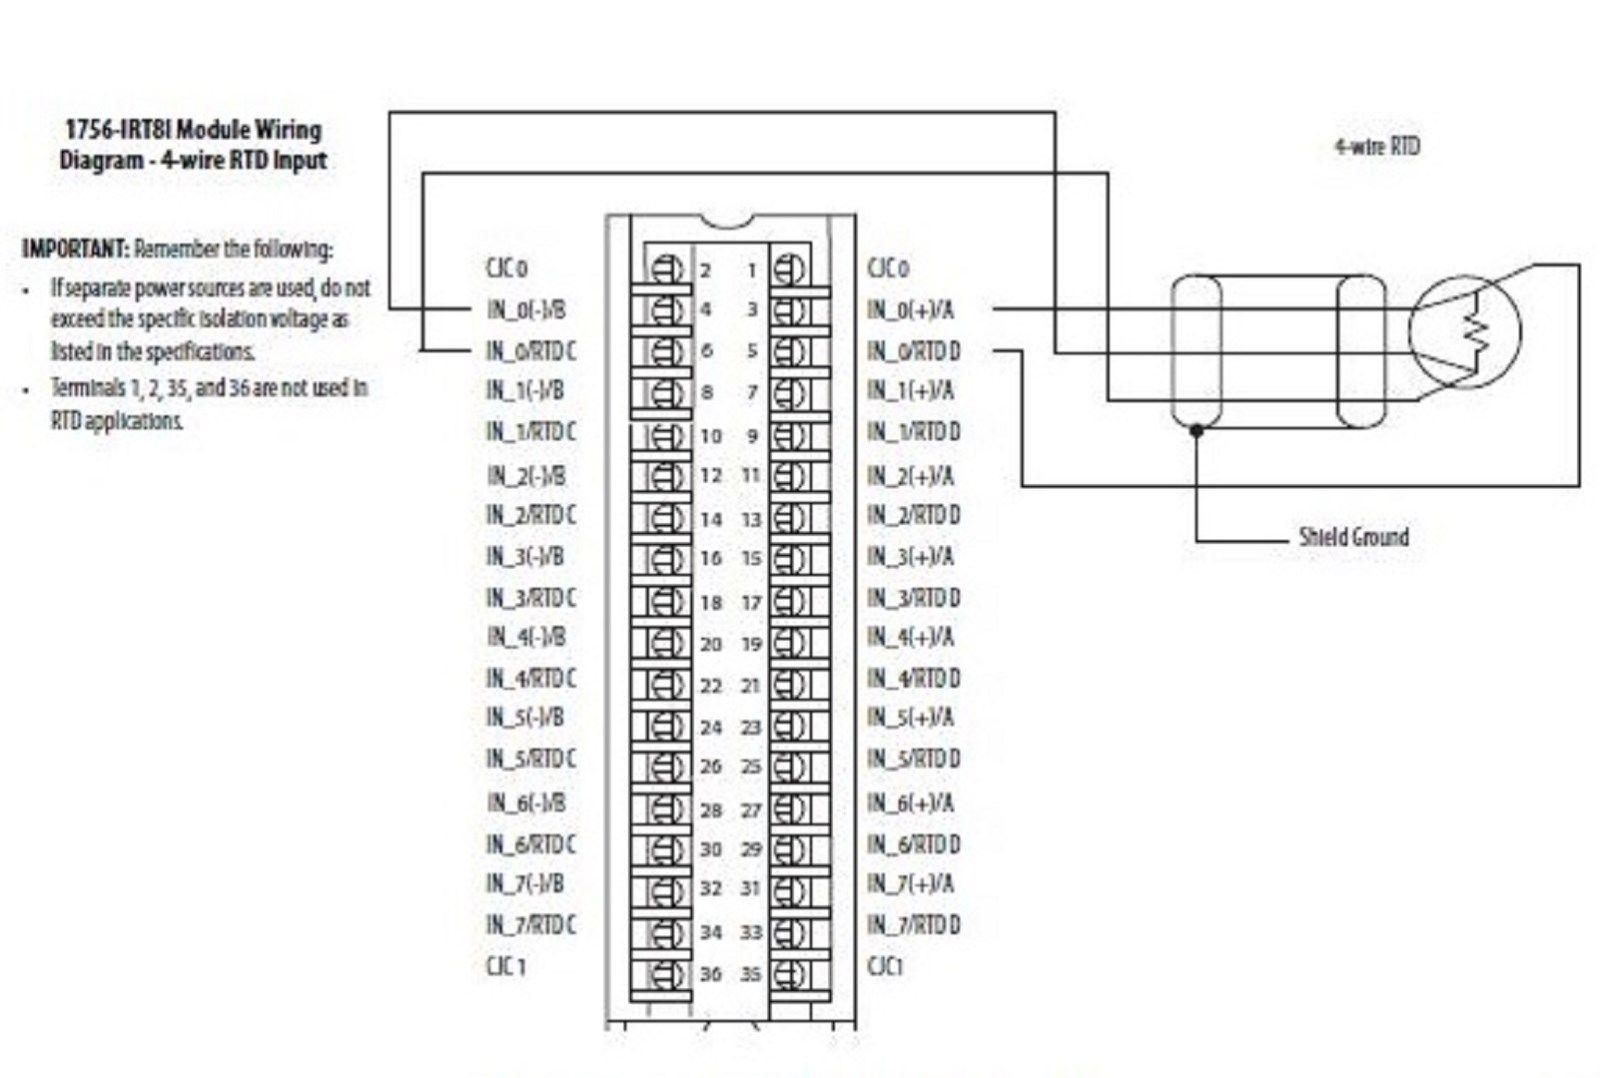 allen bradley 1794 ib16 wiring diagram free wiring diagram. Black Bedroom Furniture Sets. Home Design Ideas